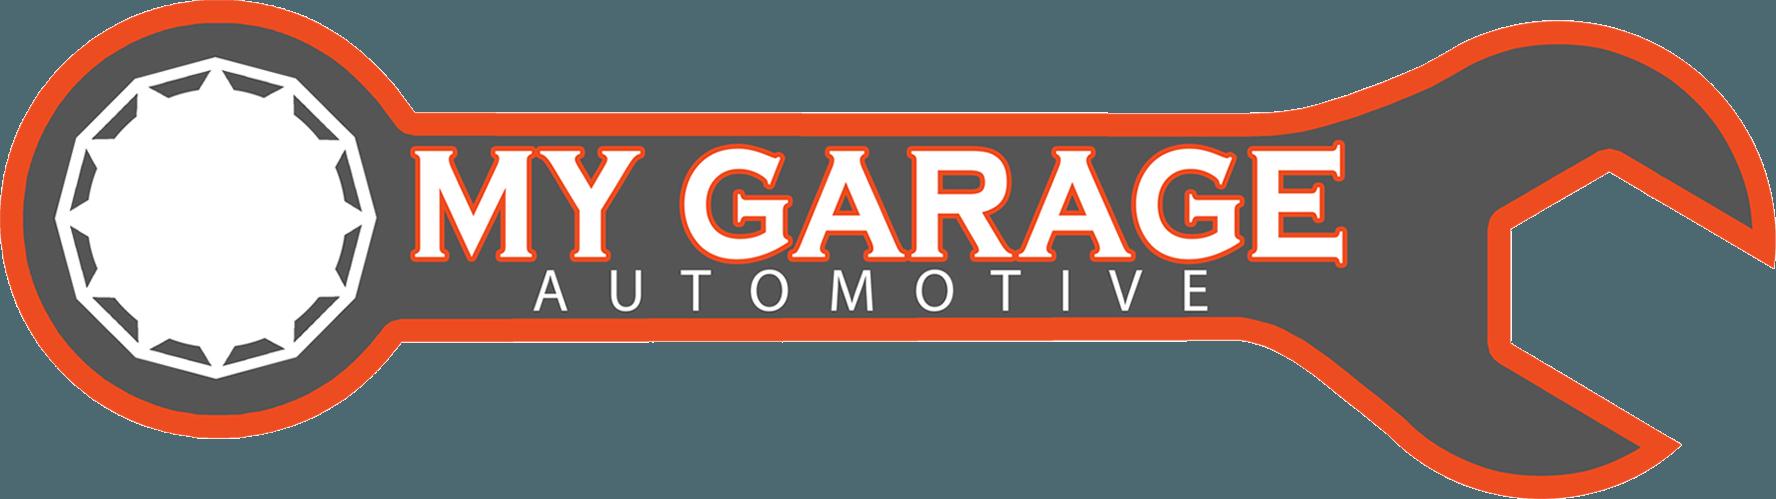 Automotive Garage Logo.